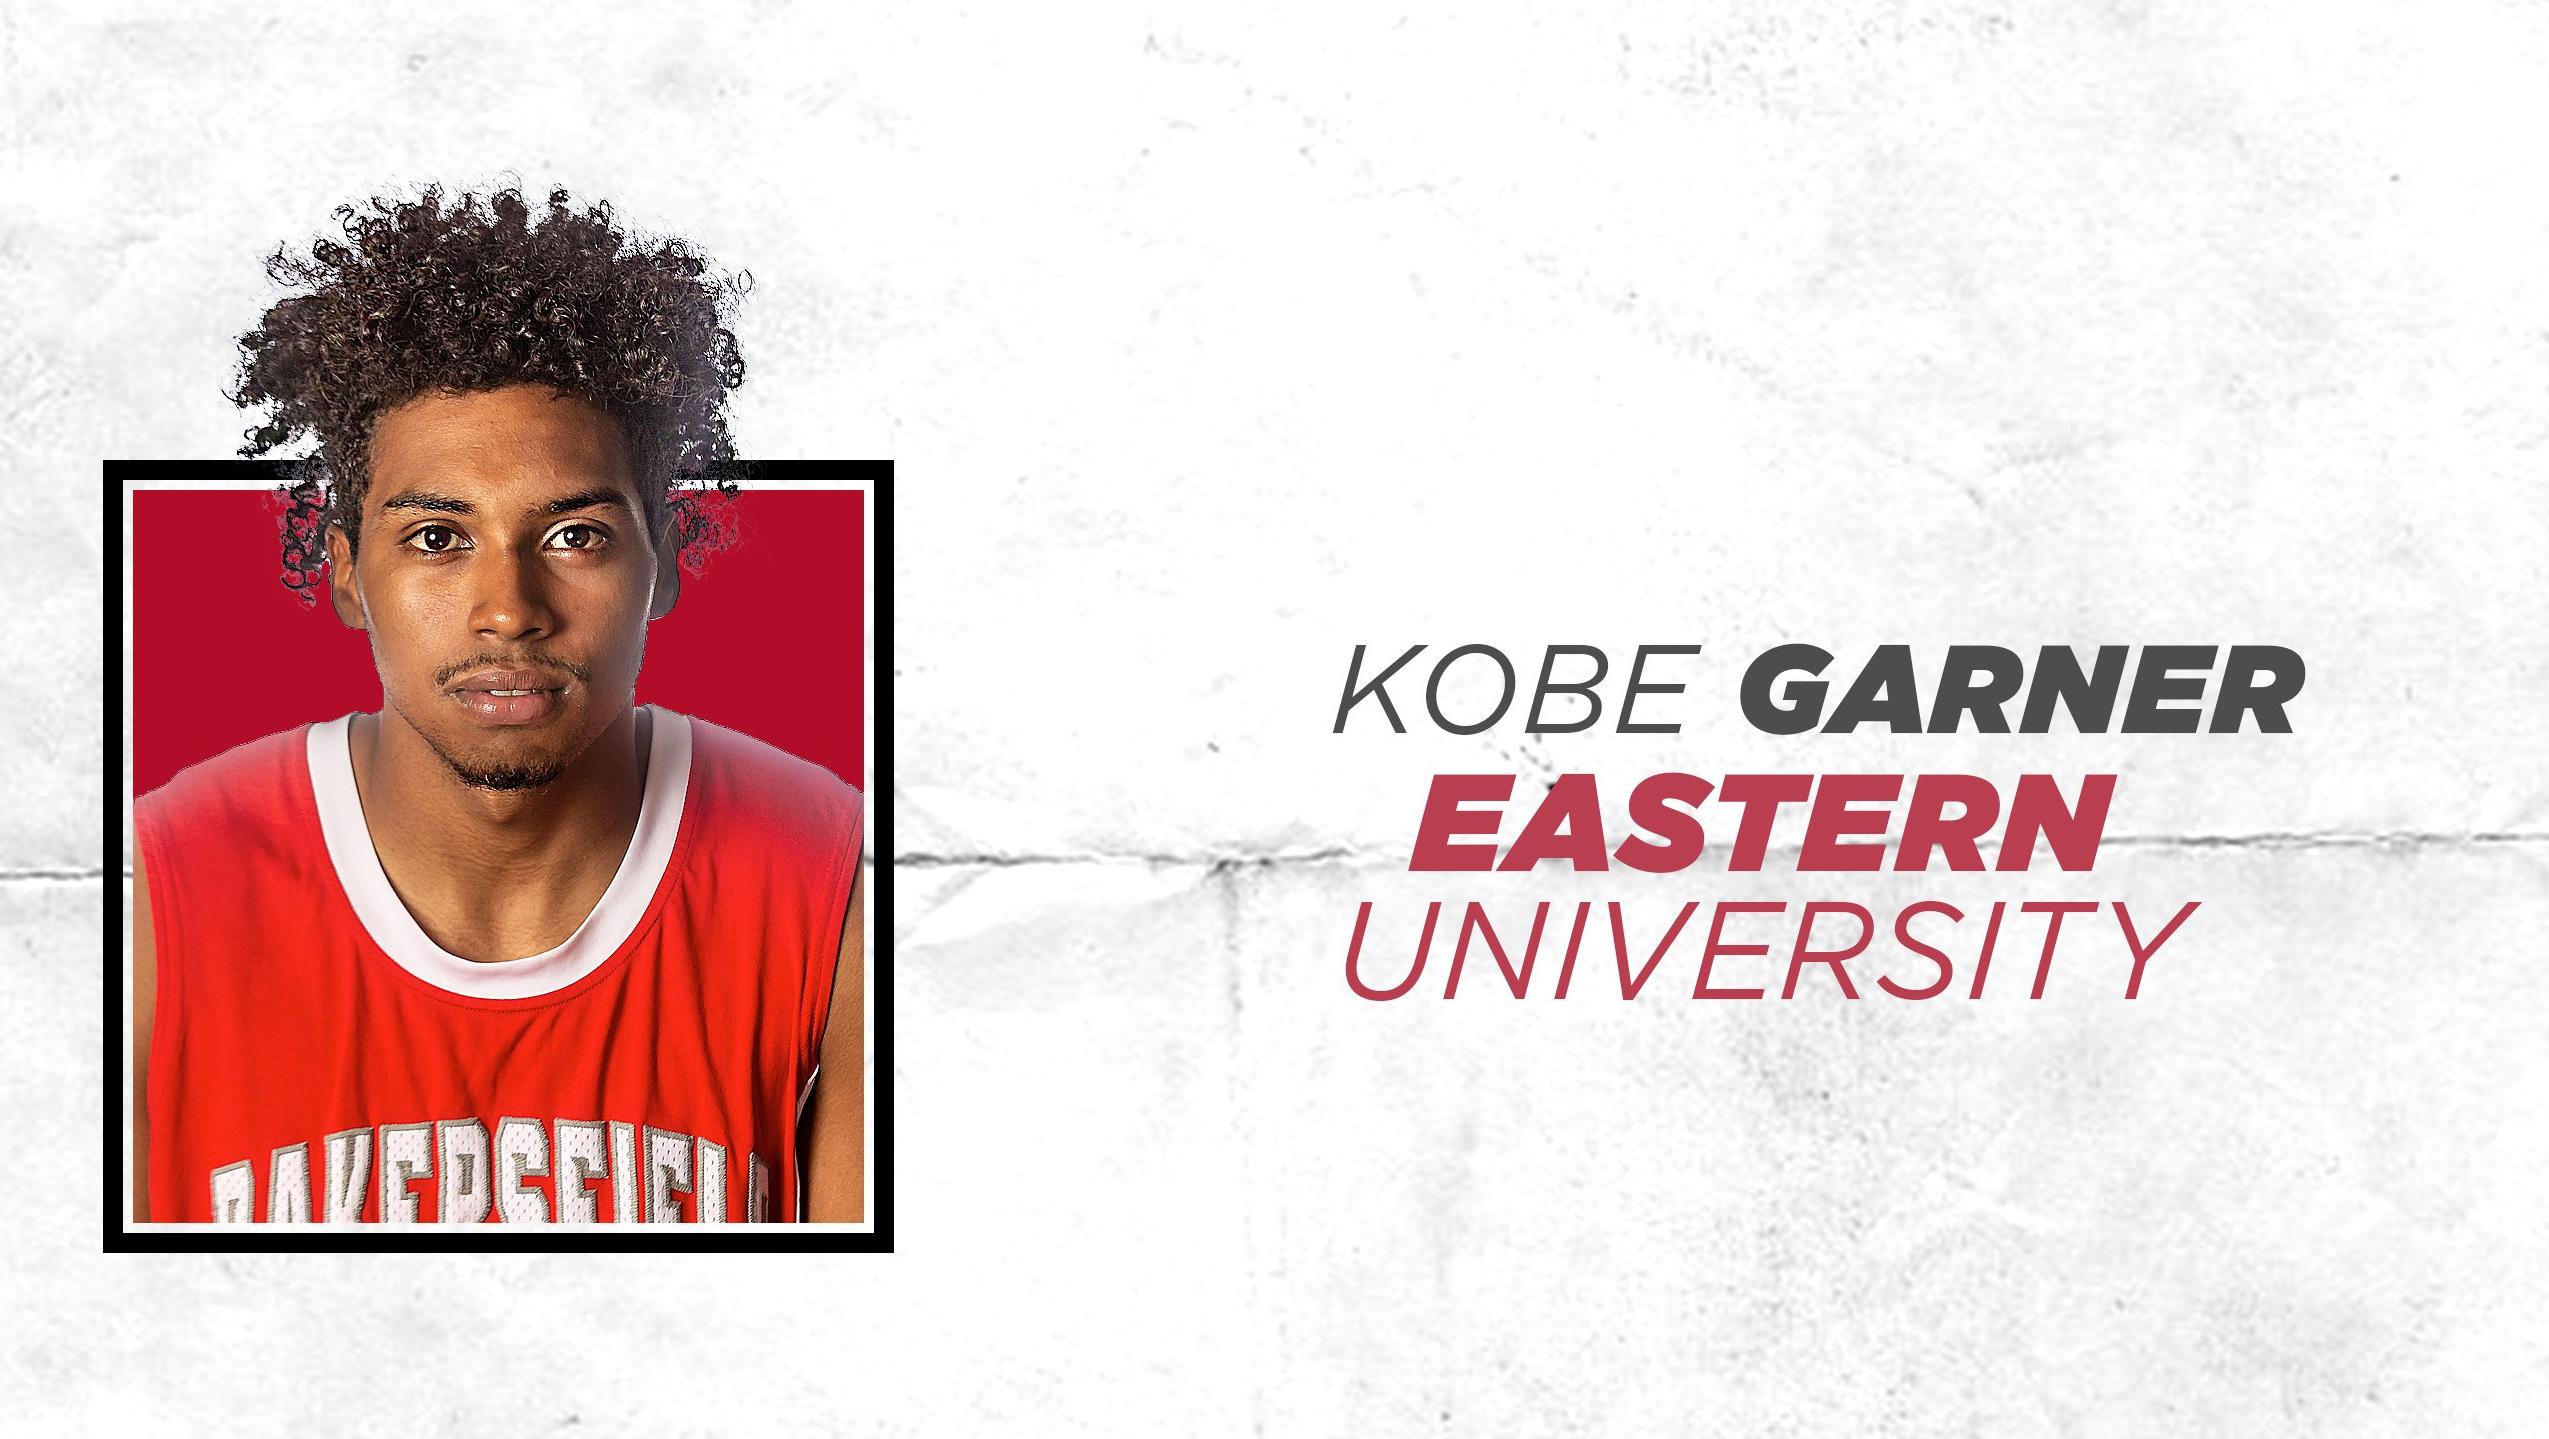 Kobe Garner Eastern University.